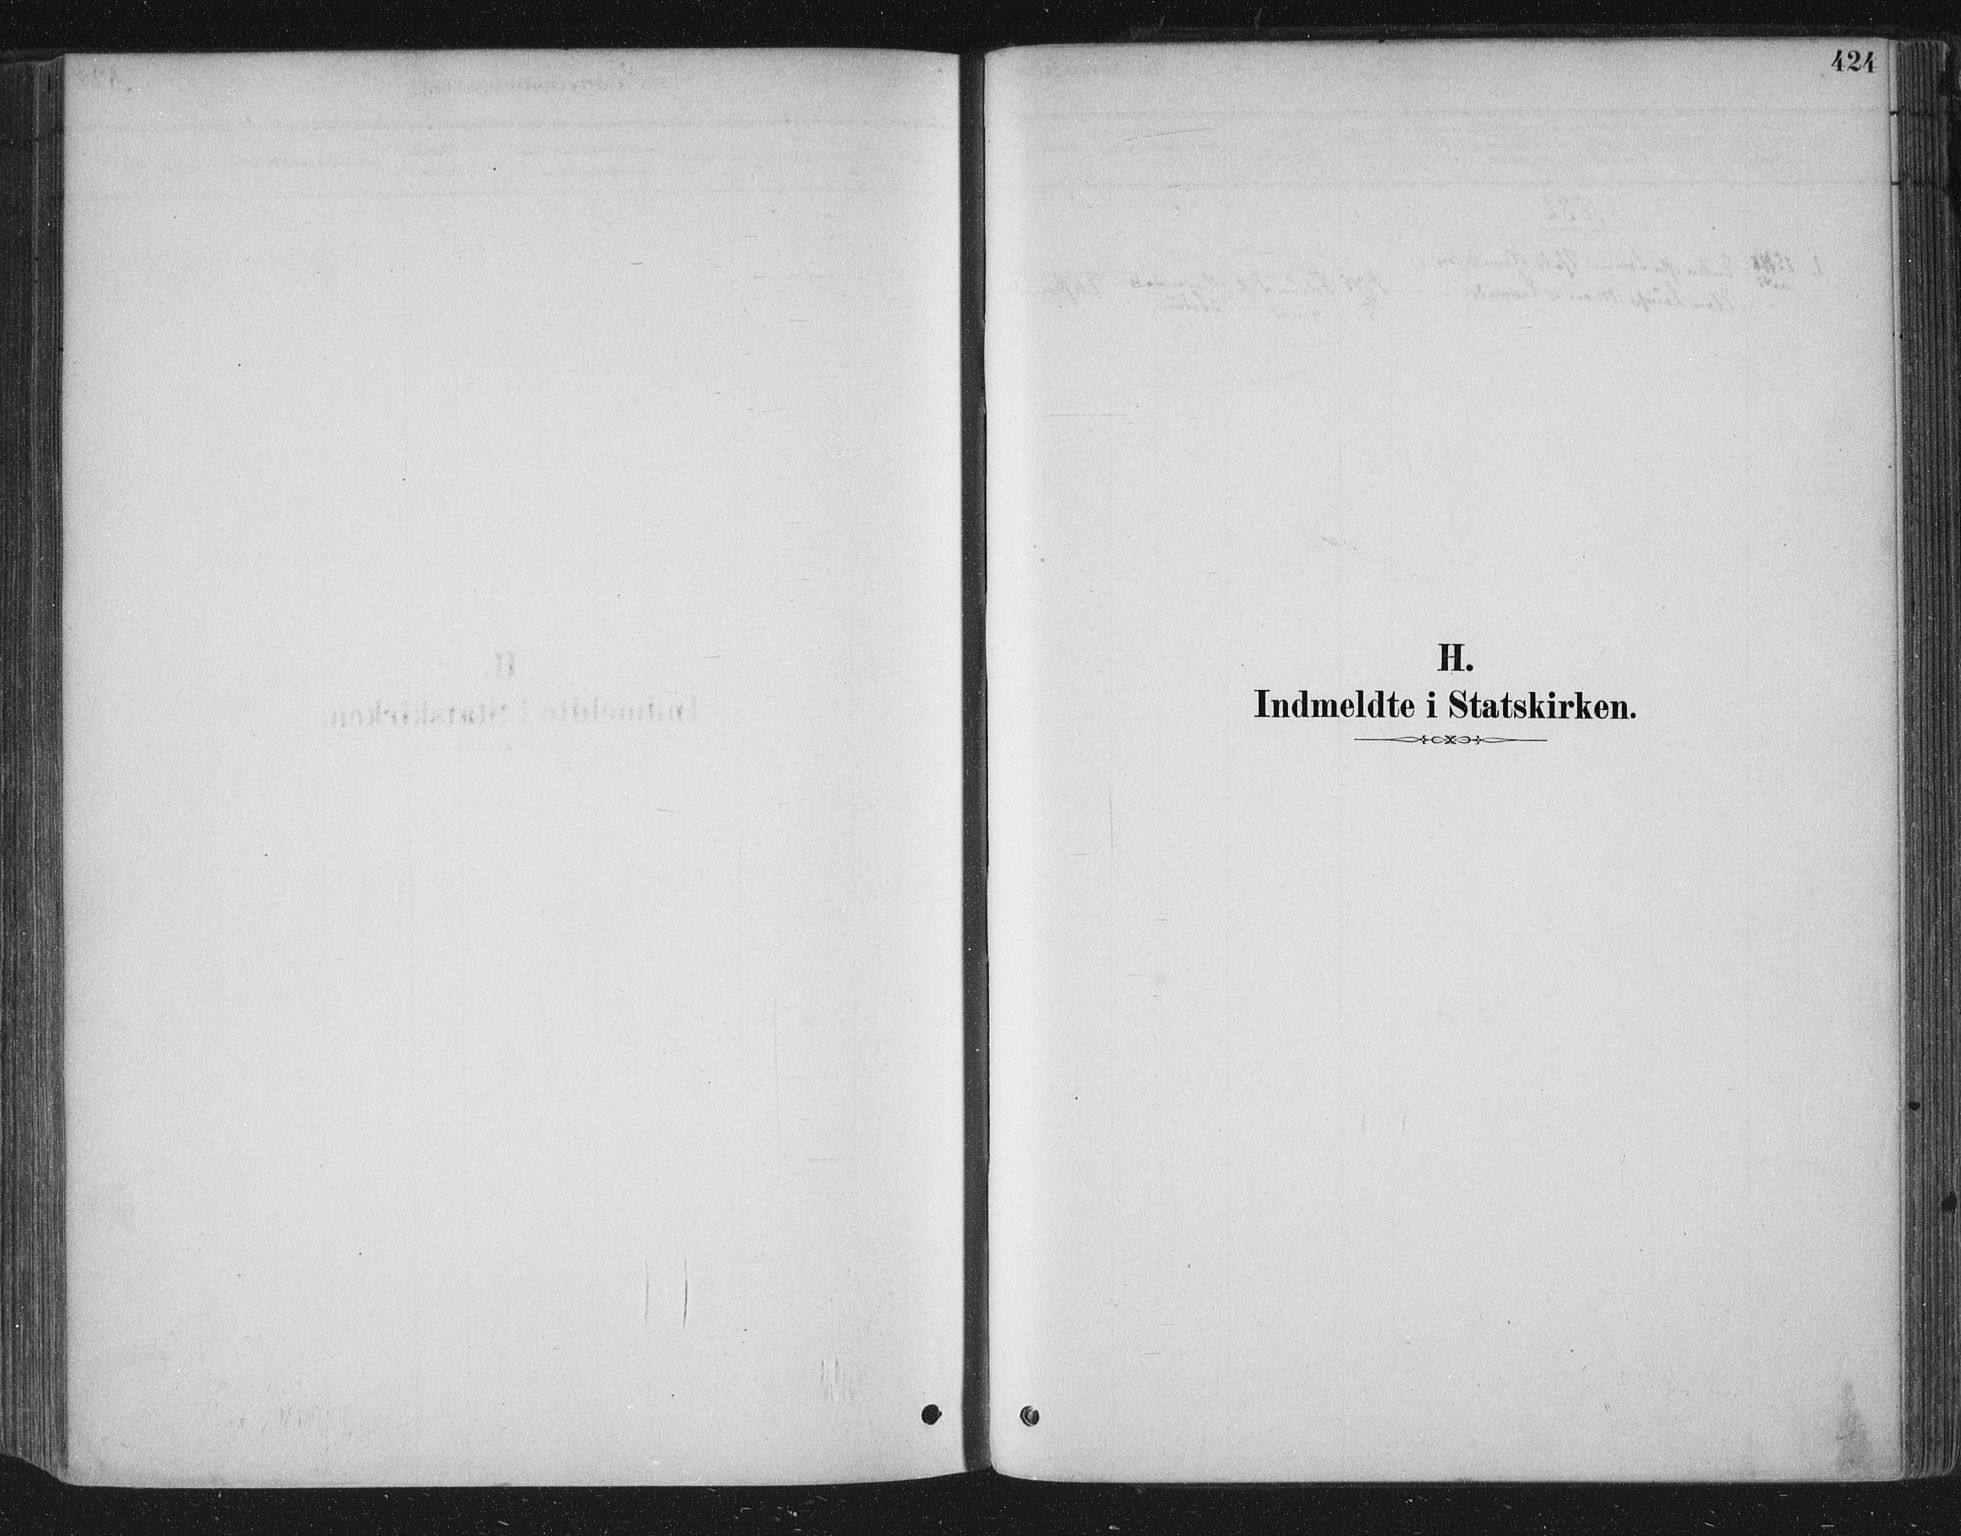 SAKO, Bamble kirkebøker, F/Fa/L0007: Ministerialbok nr. I 7, 1878-1888, s. 424